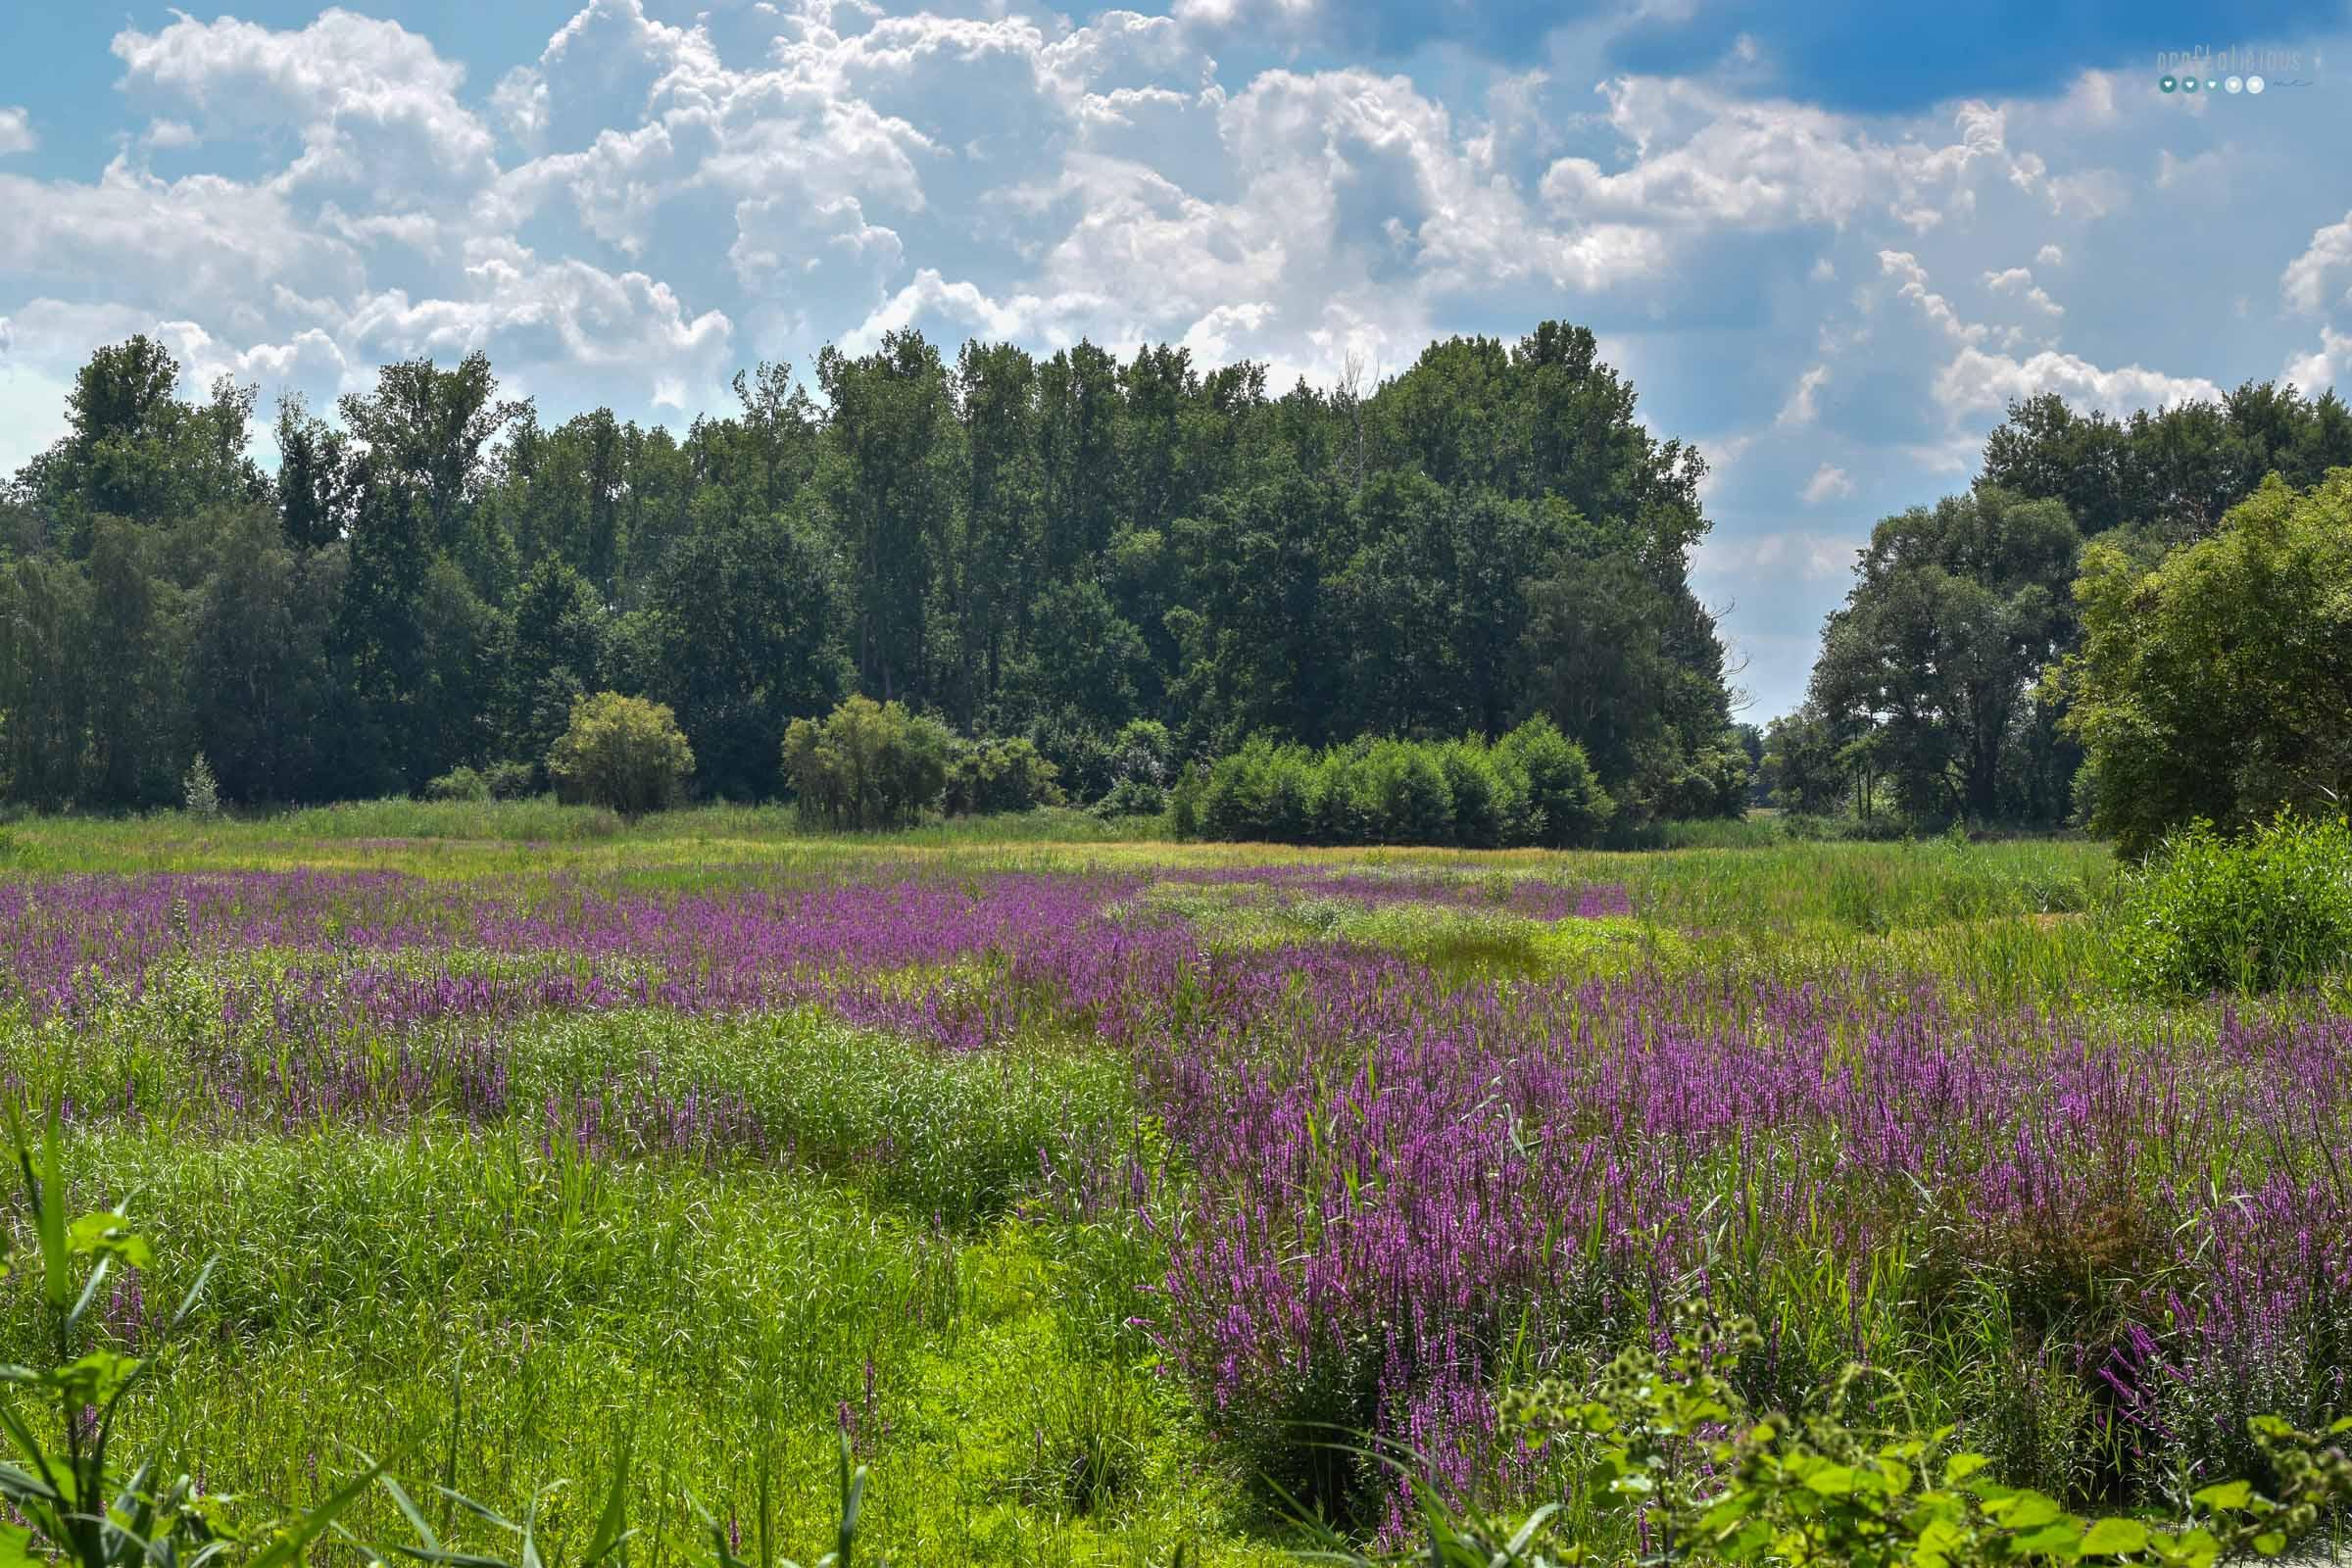 craftaliciousme seeking creative life enjoying summer at home in Brandenburg